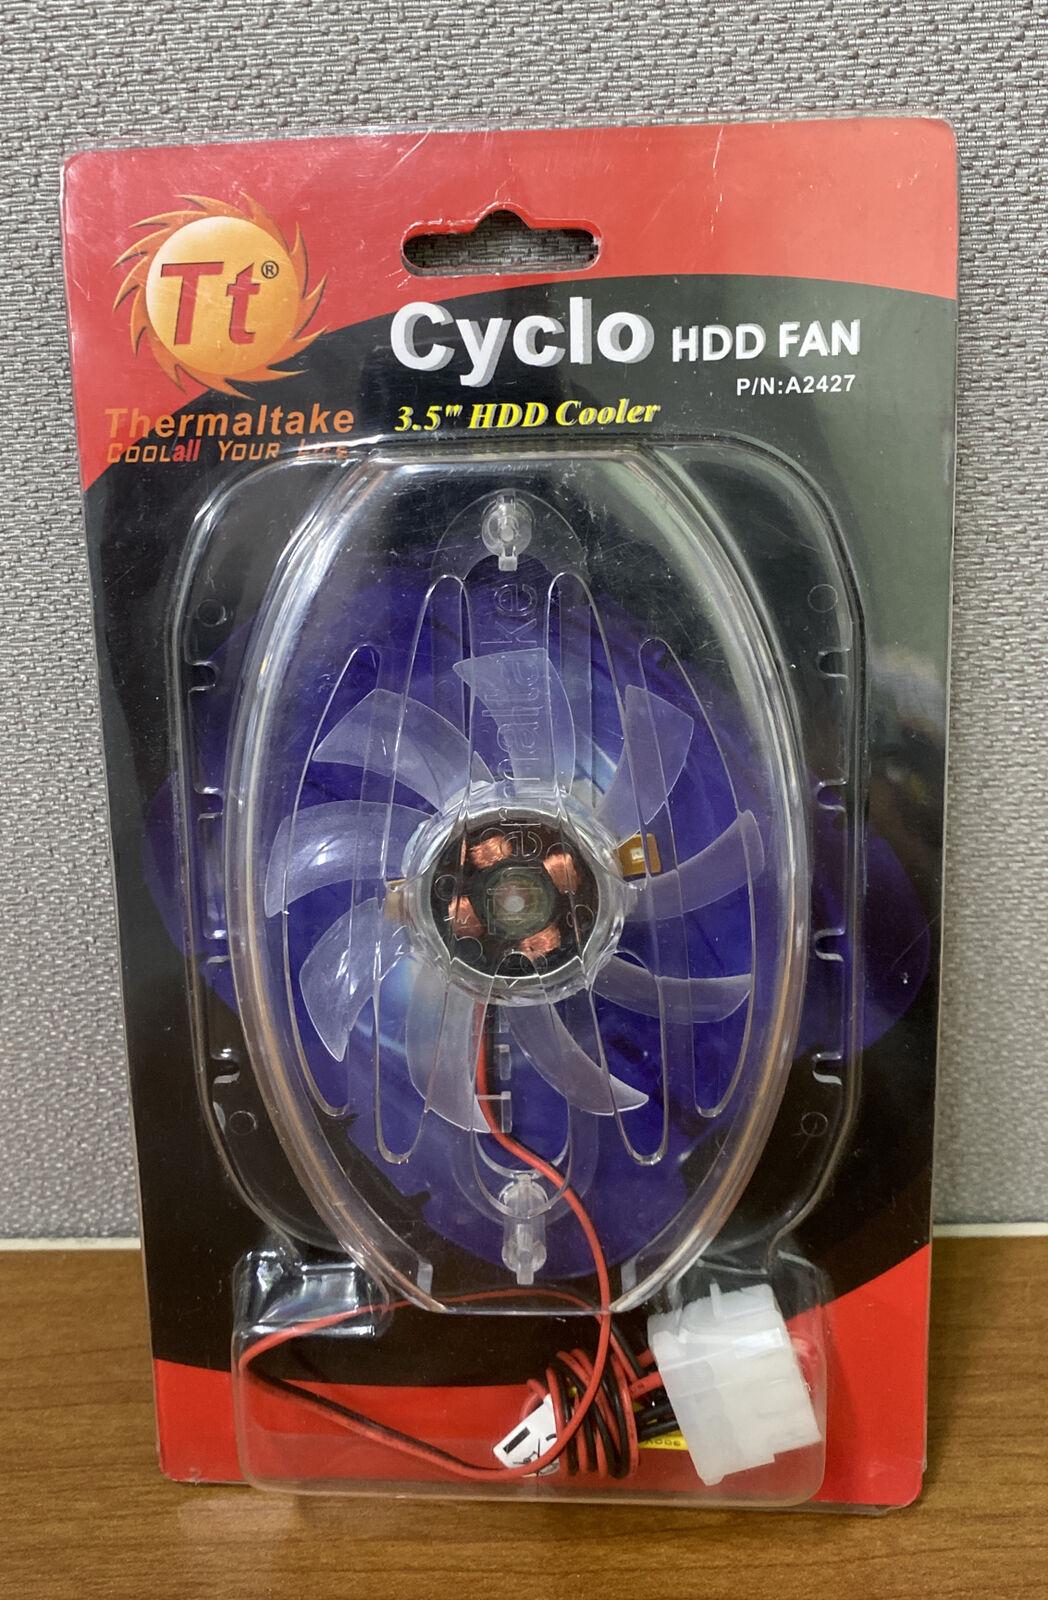 Thermaltake A2427 Cyclo 3.5